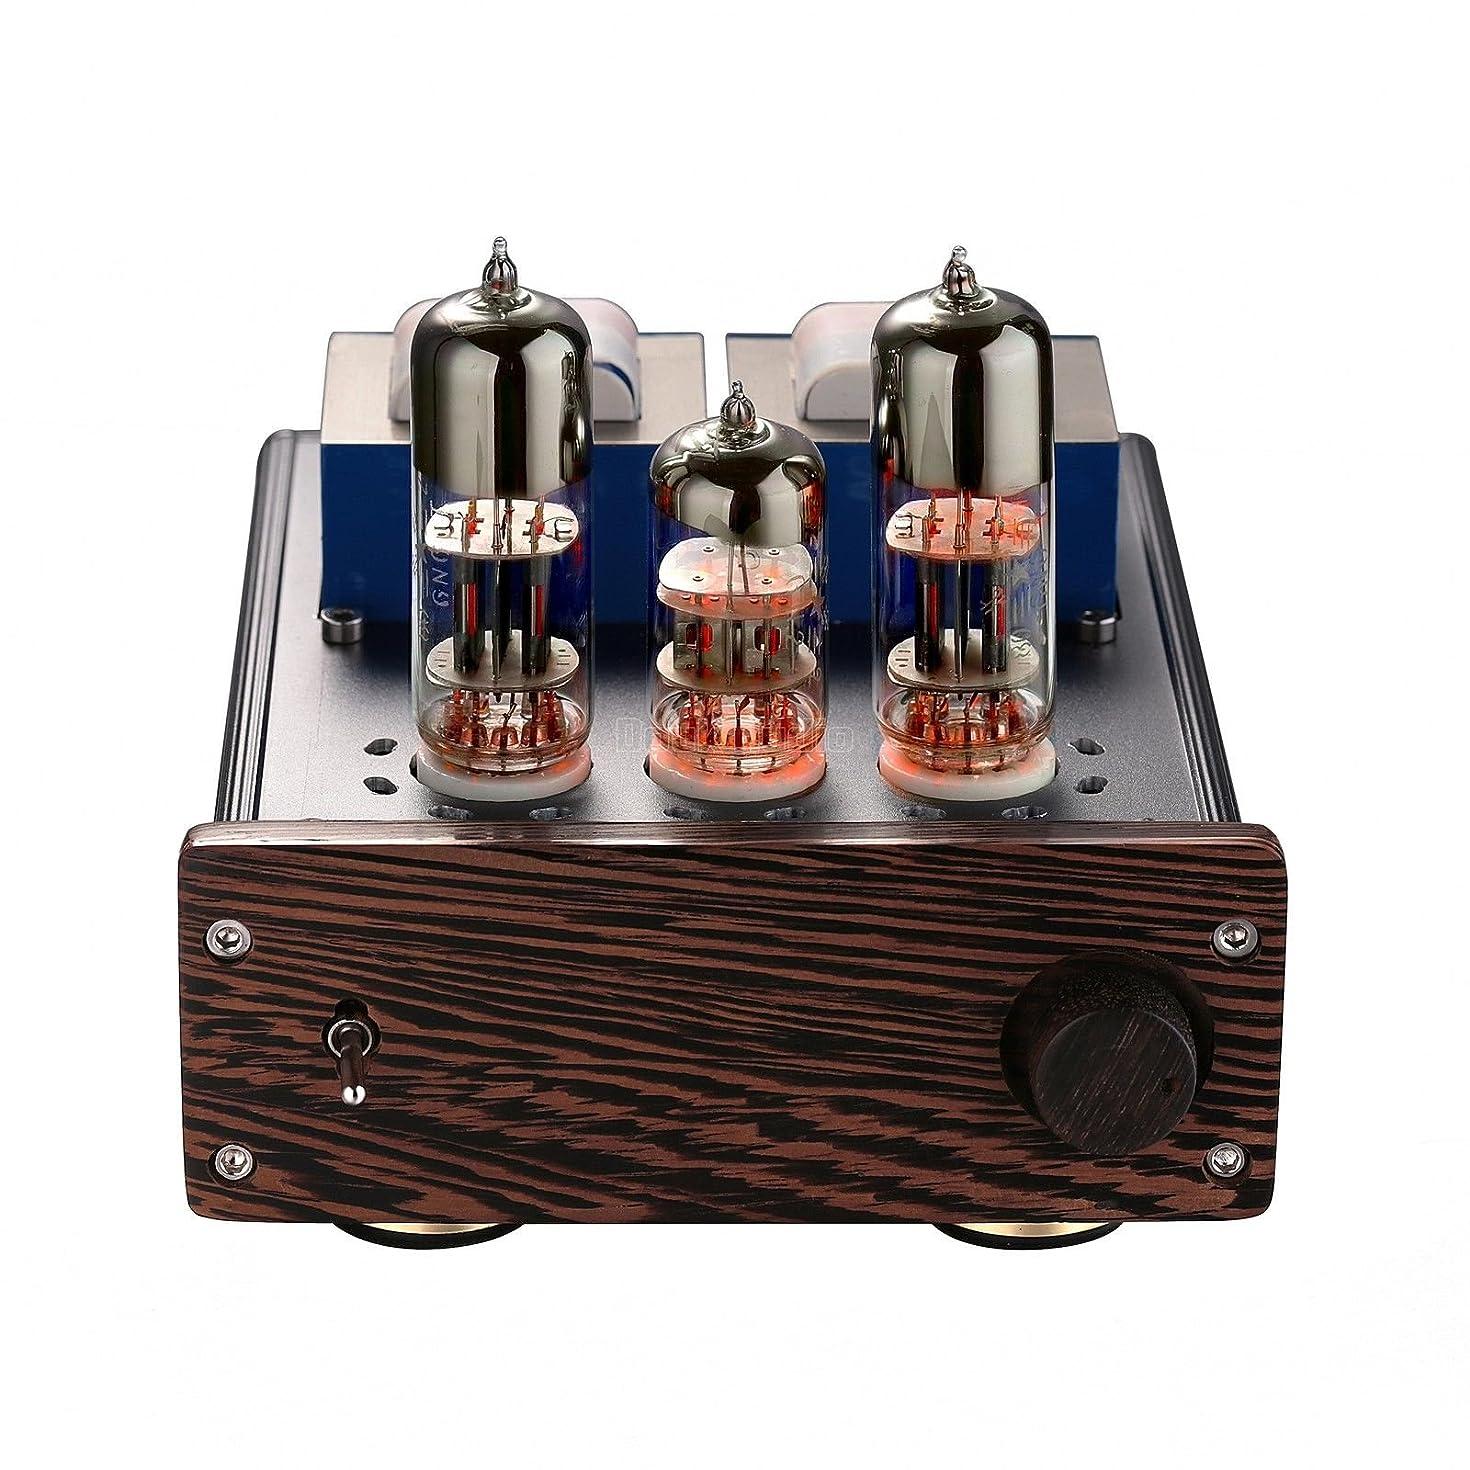 Nobsound Mini 20-Watt 6N6+6N2 Vacuum Tube Amplifier SEPP Class AB Desktop Stereo Power Amp for HiFi Home Audio Sound System (DJ418)